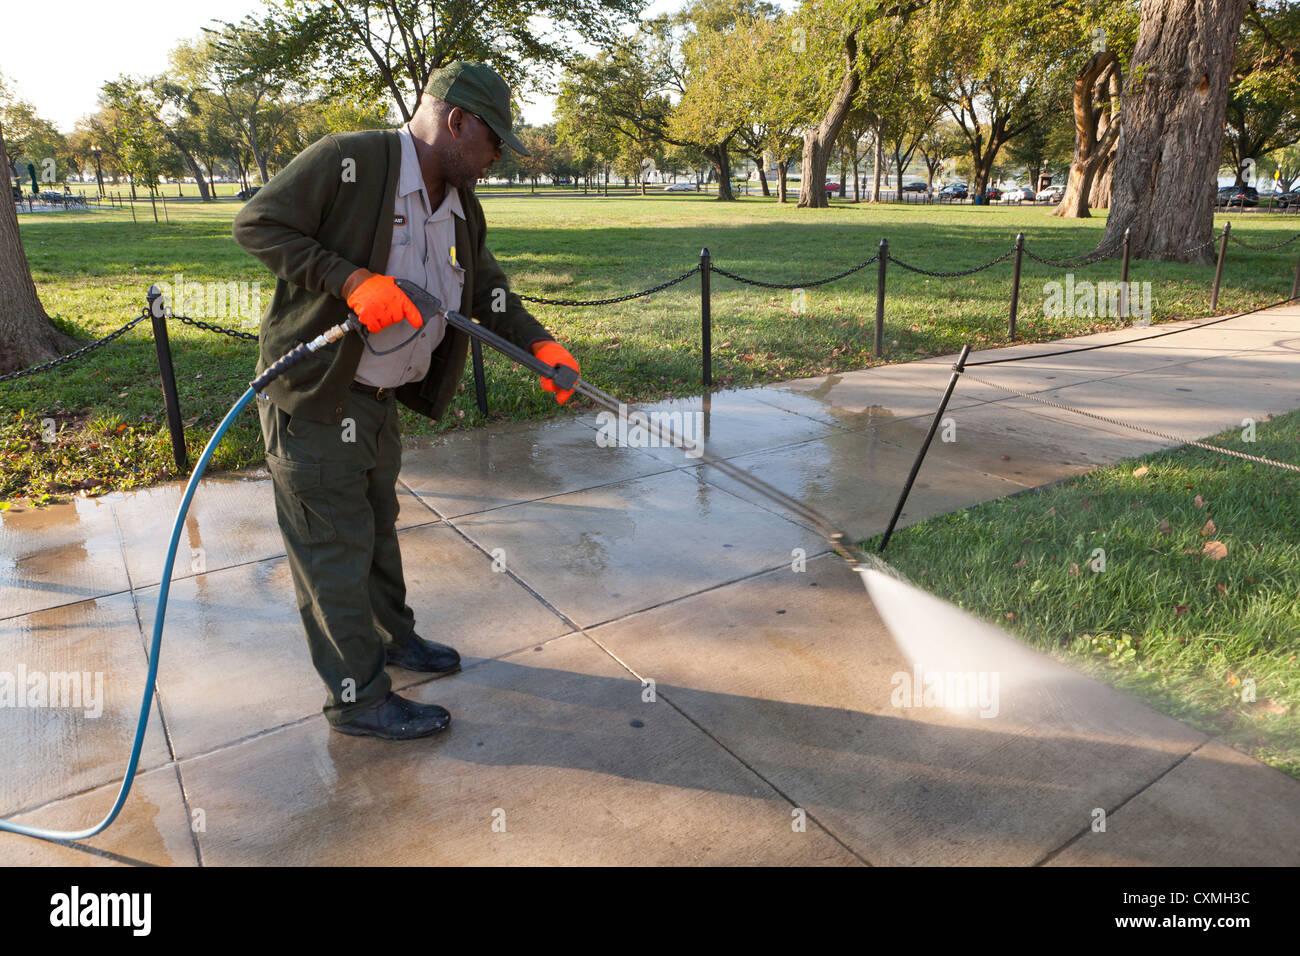 Municipal worker pressure washing sidewalk - Washington, DC USA - Stock Image